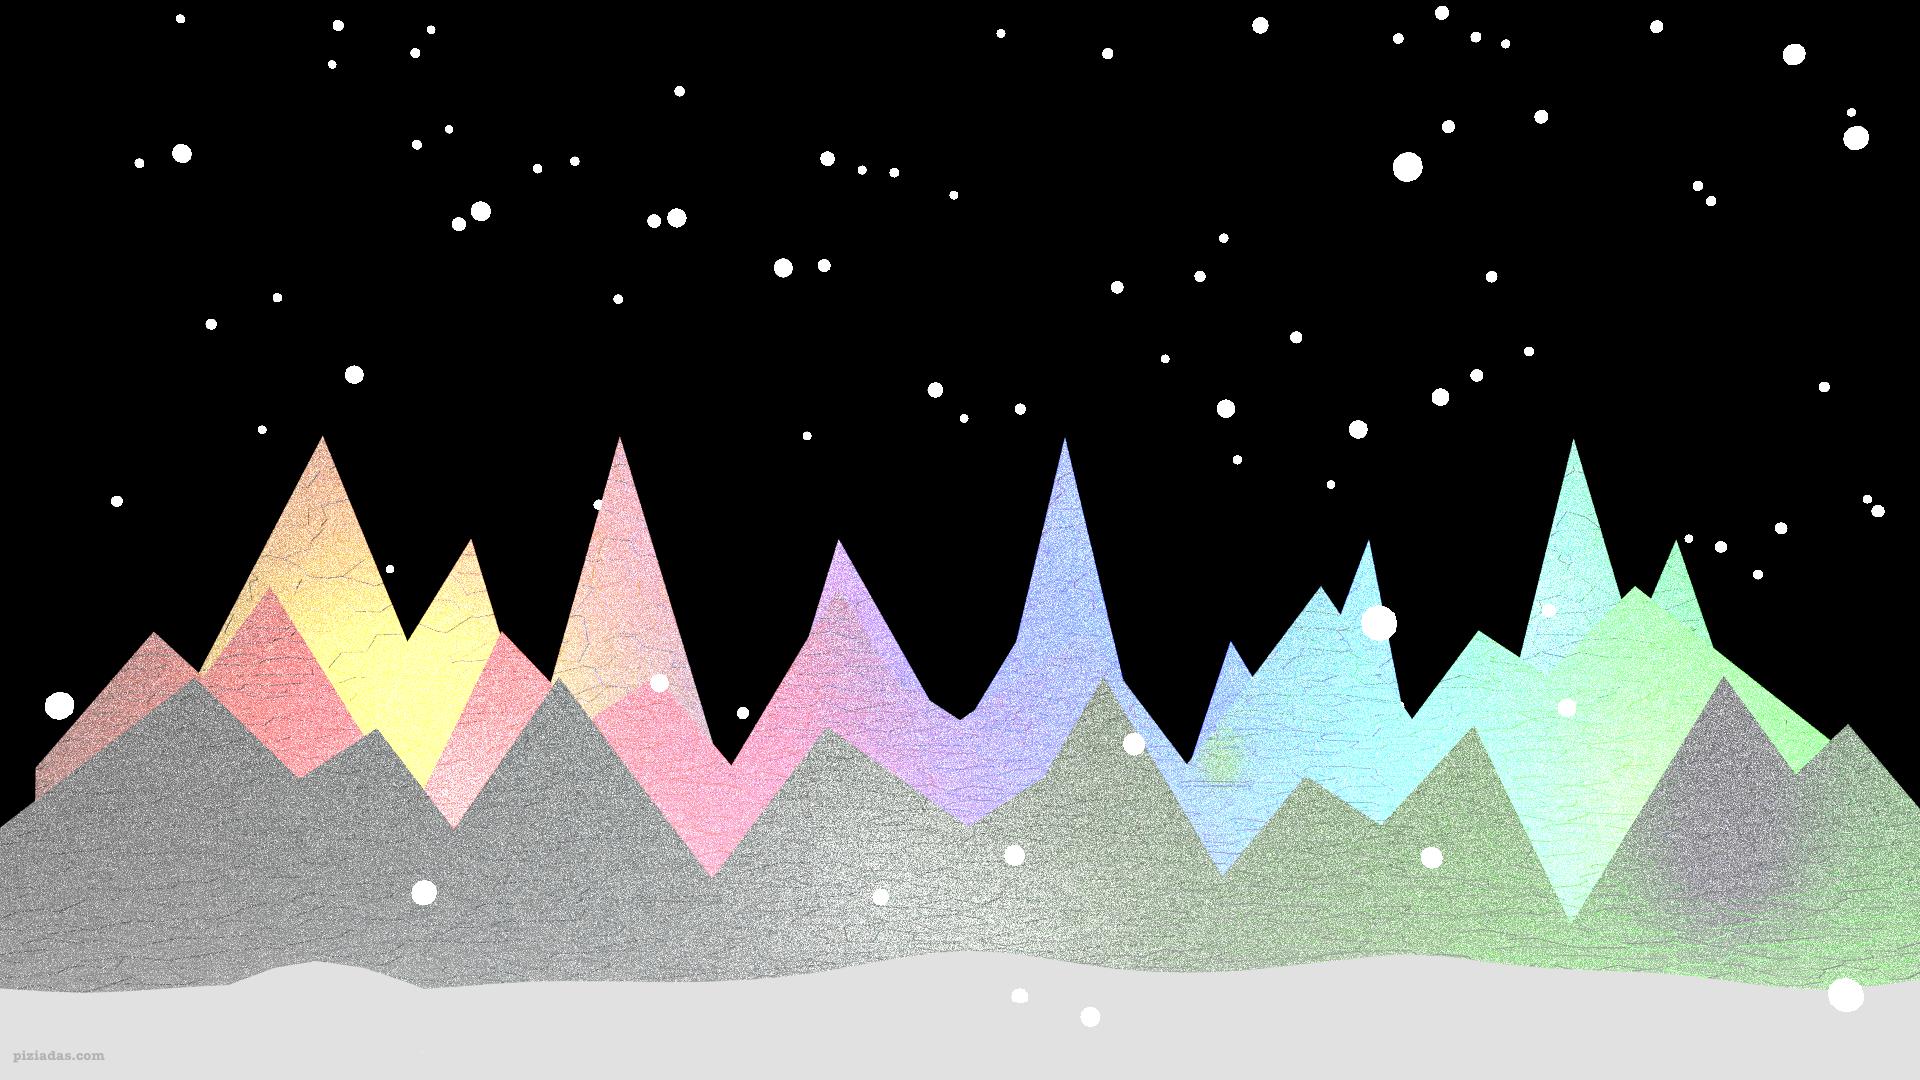 Tumblr Fondos De Pantalla De Navidad